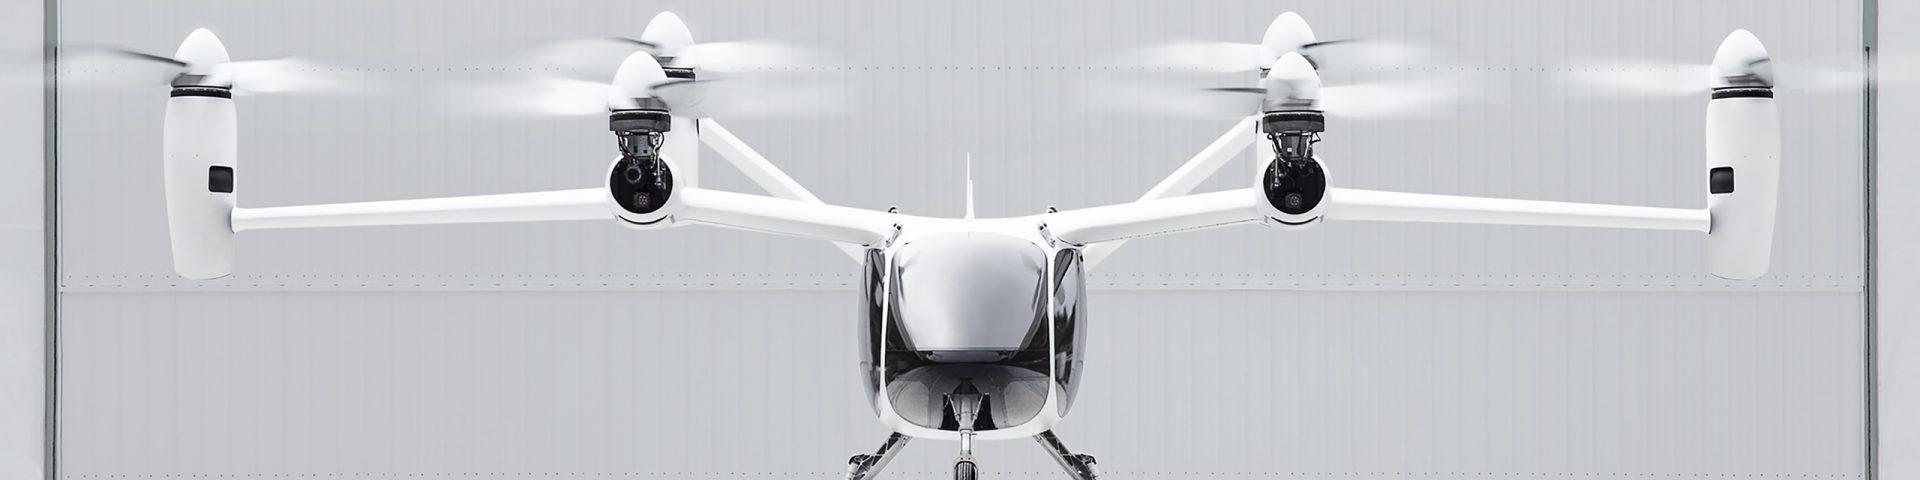 Joby-aviation vue de face